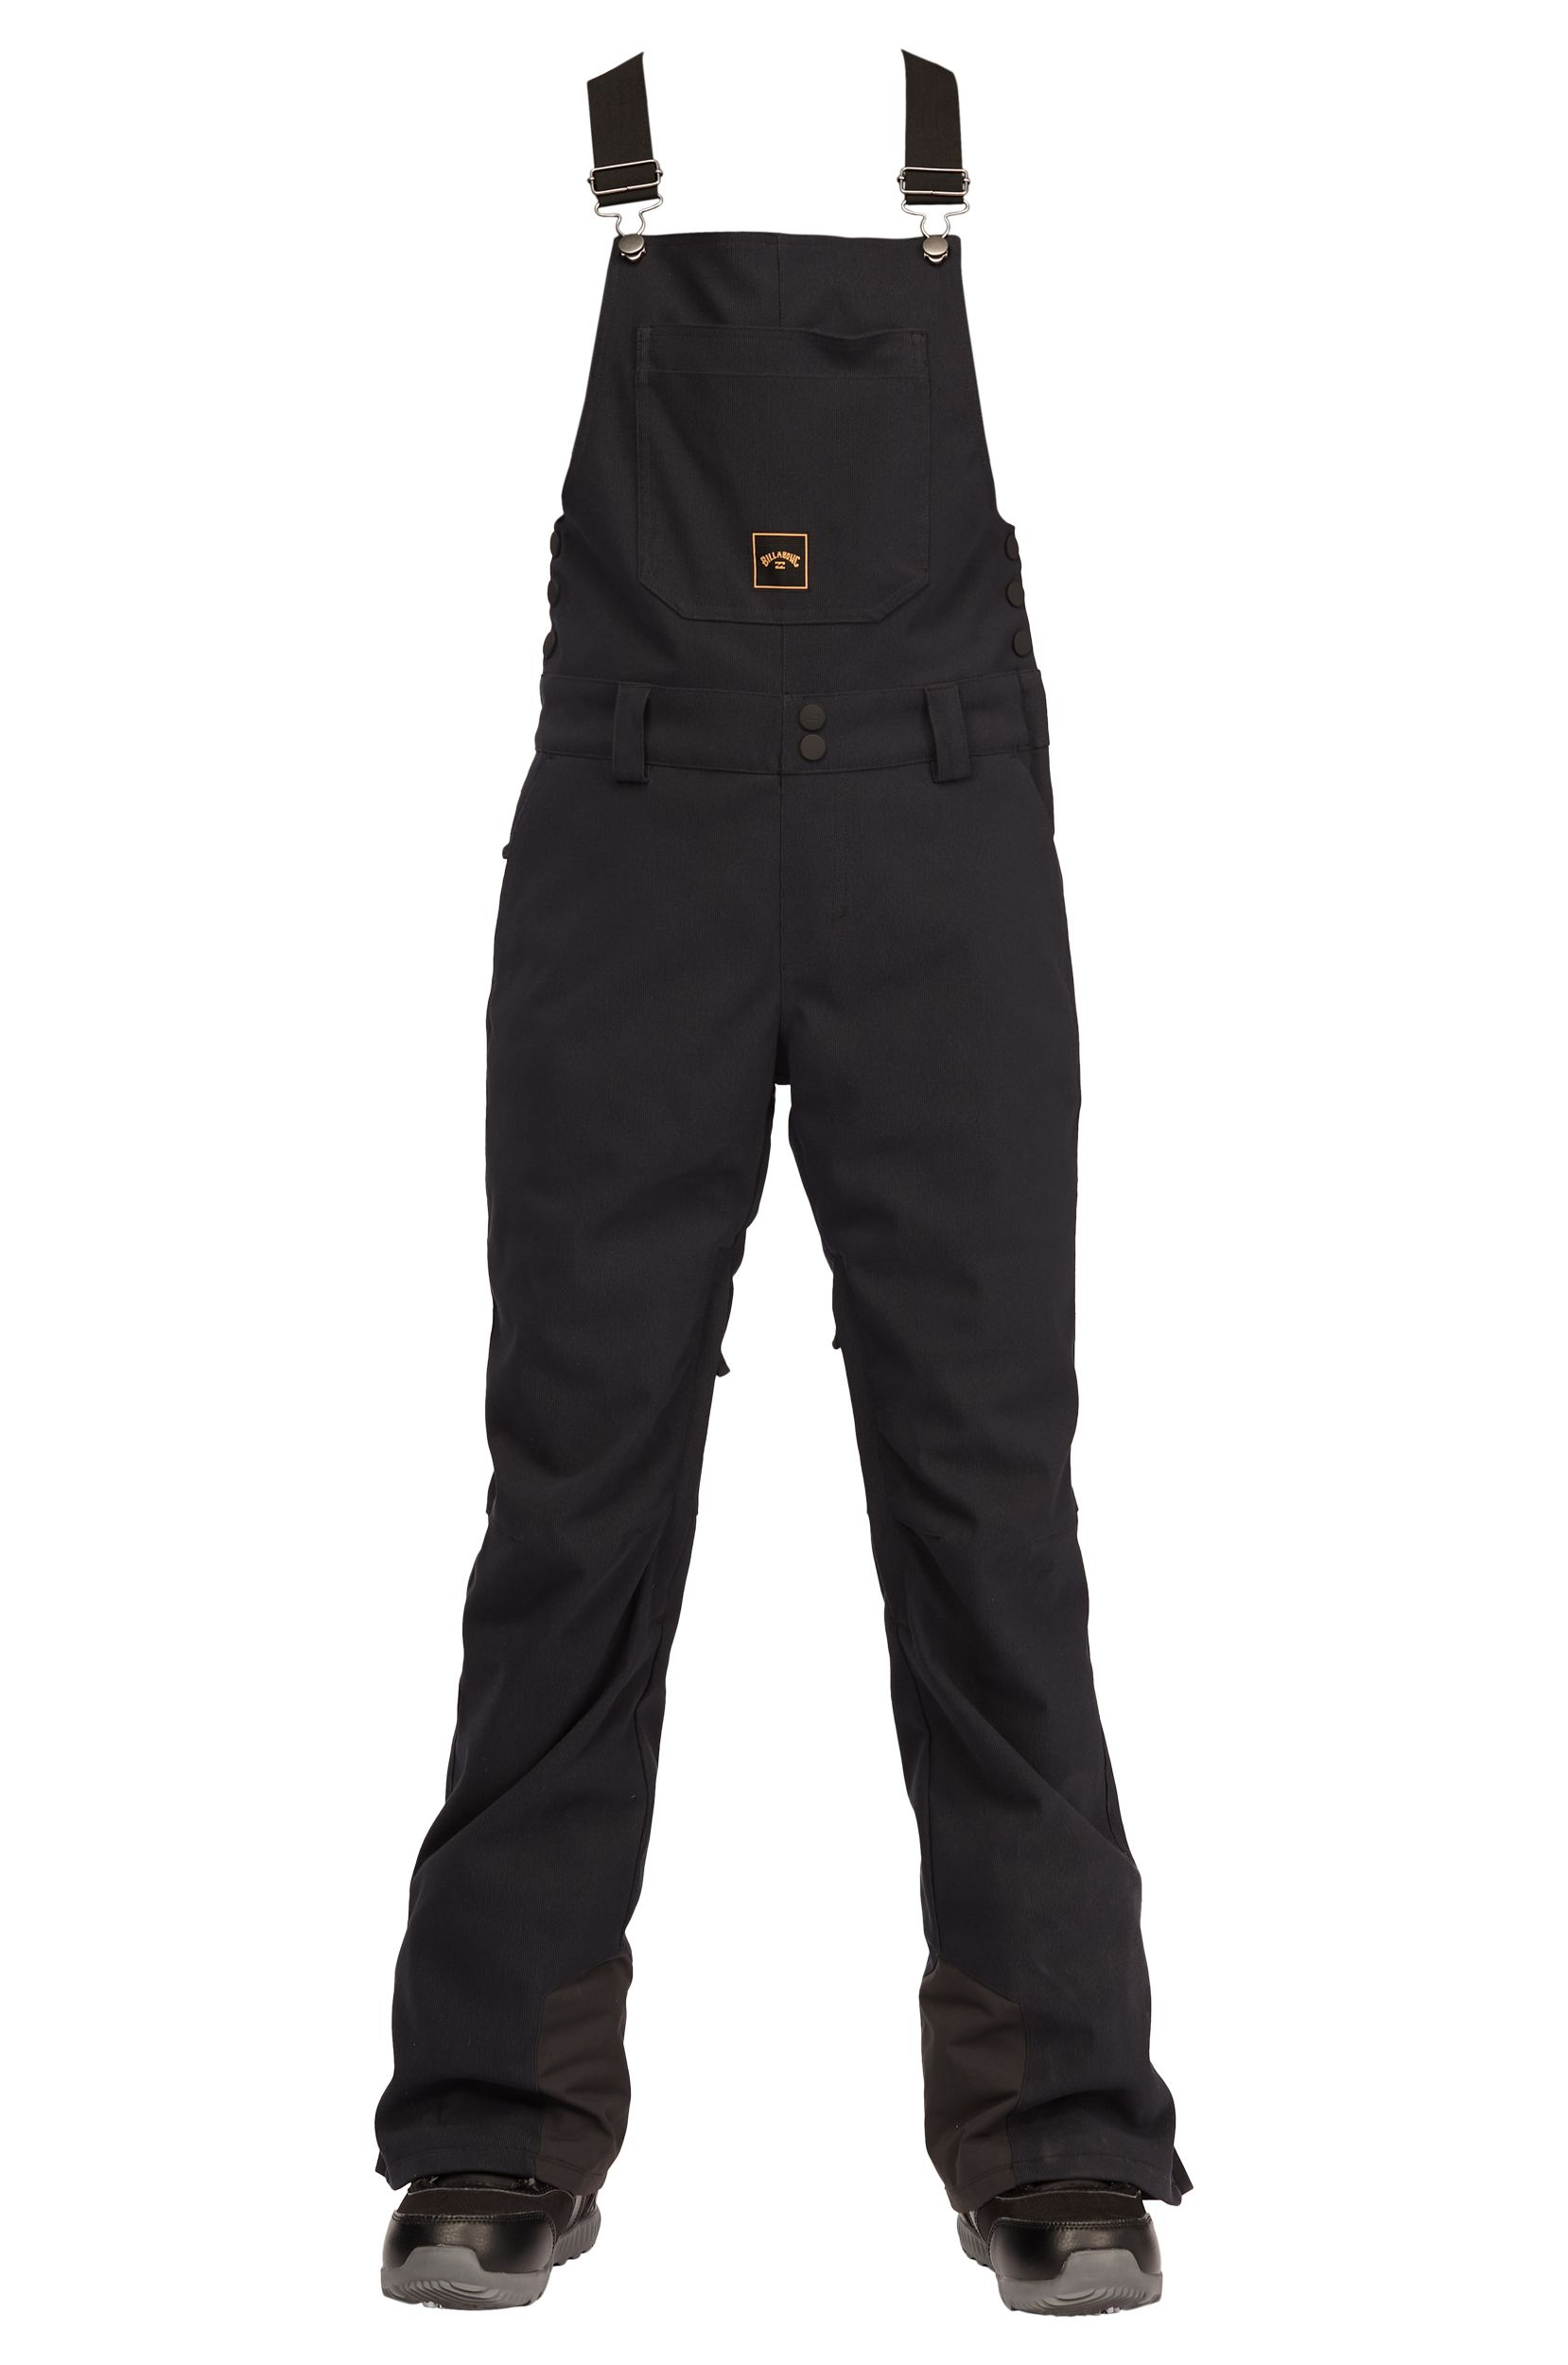 Billabong Pants RIVA BIB Black